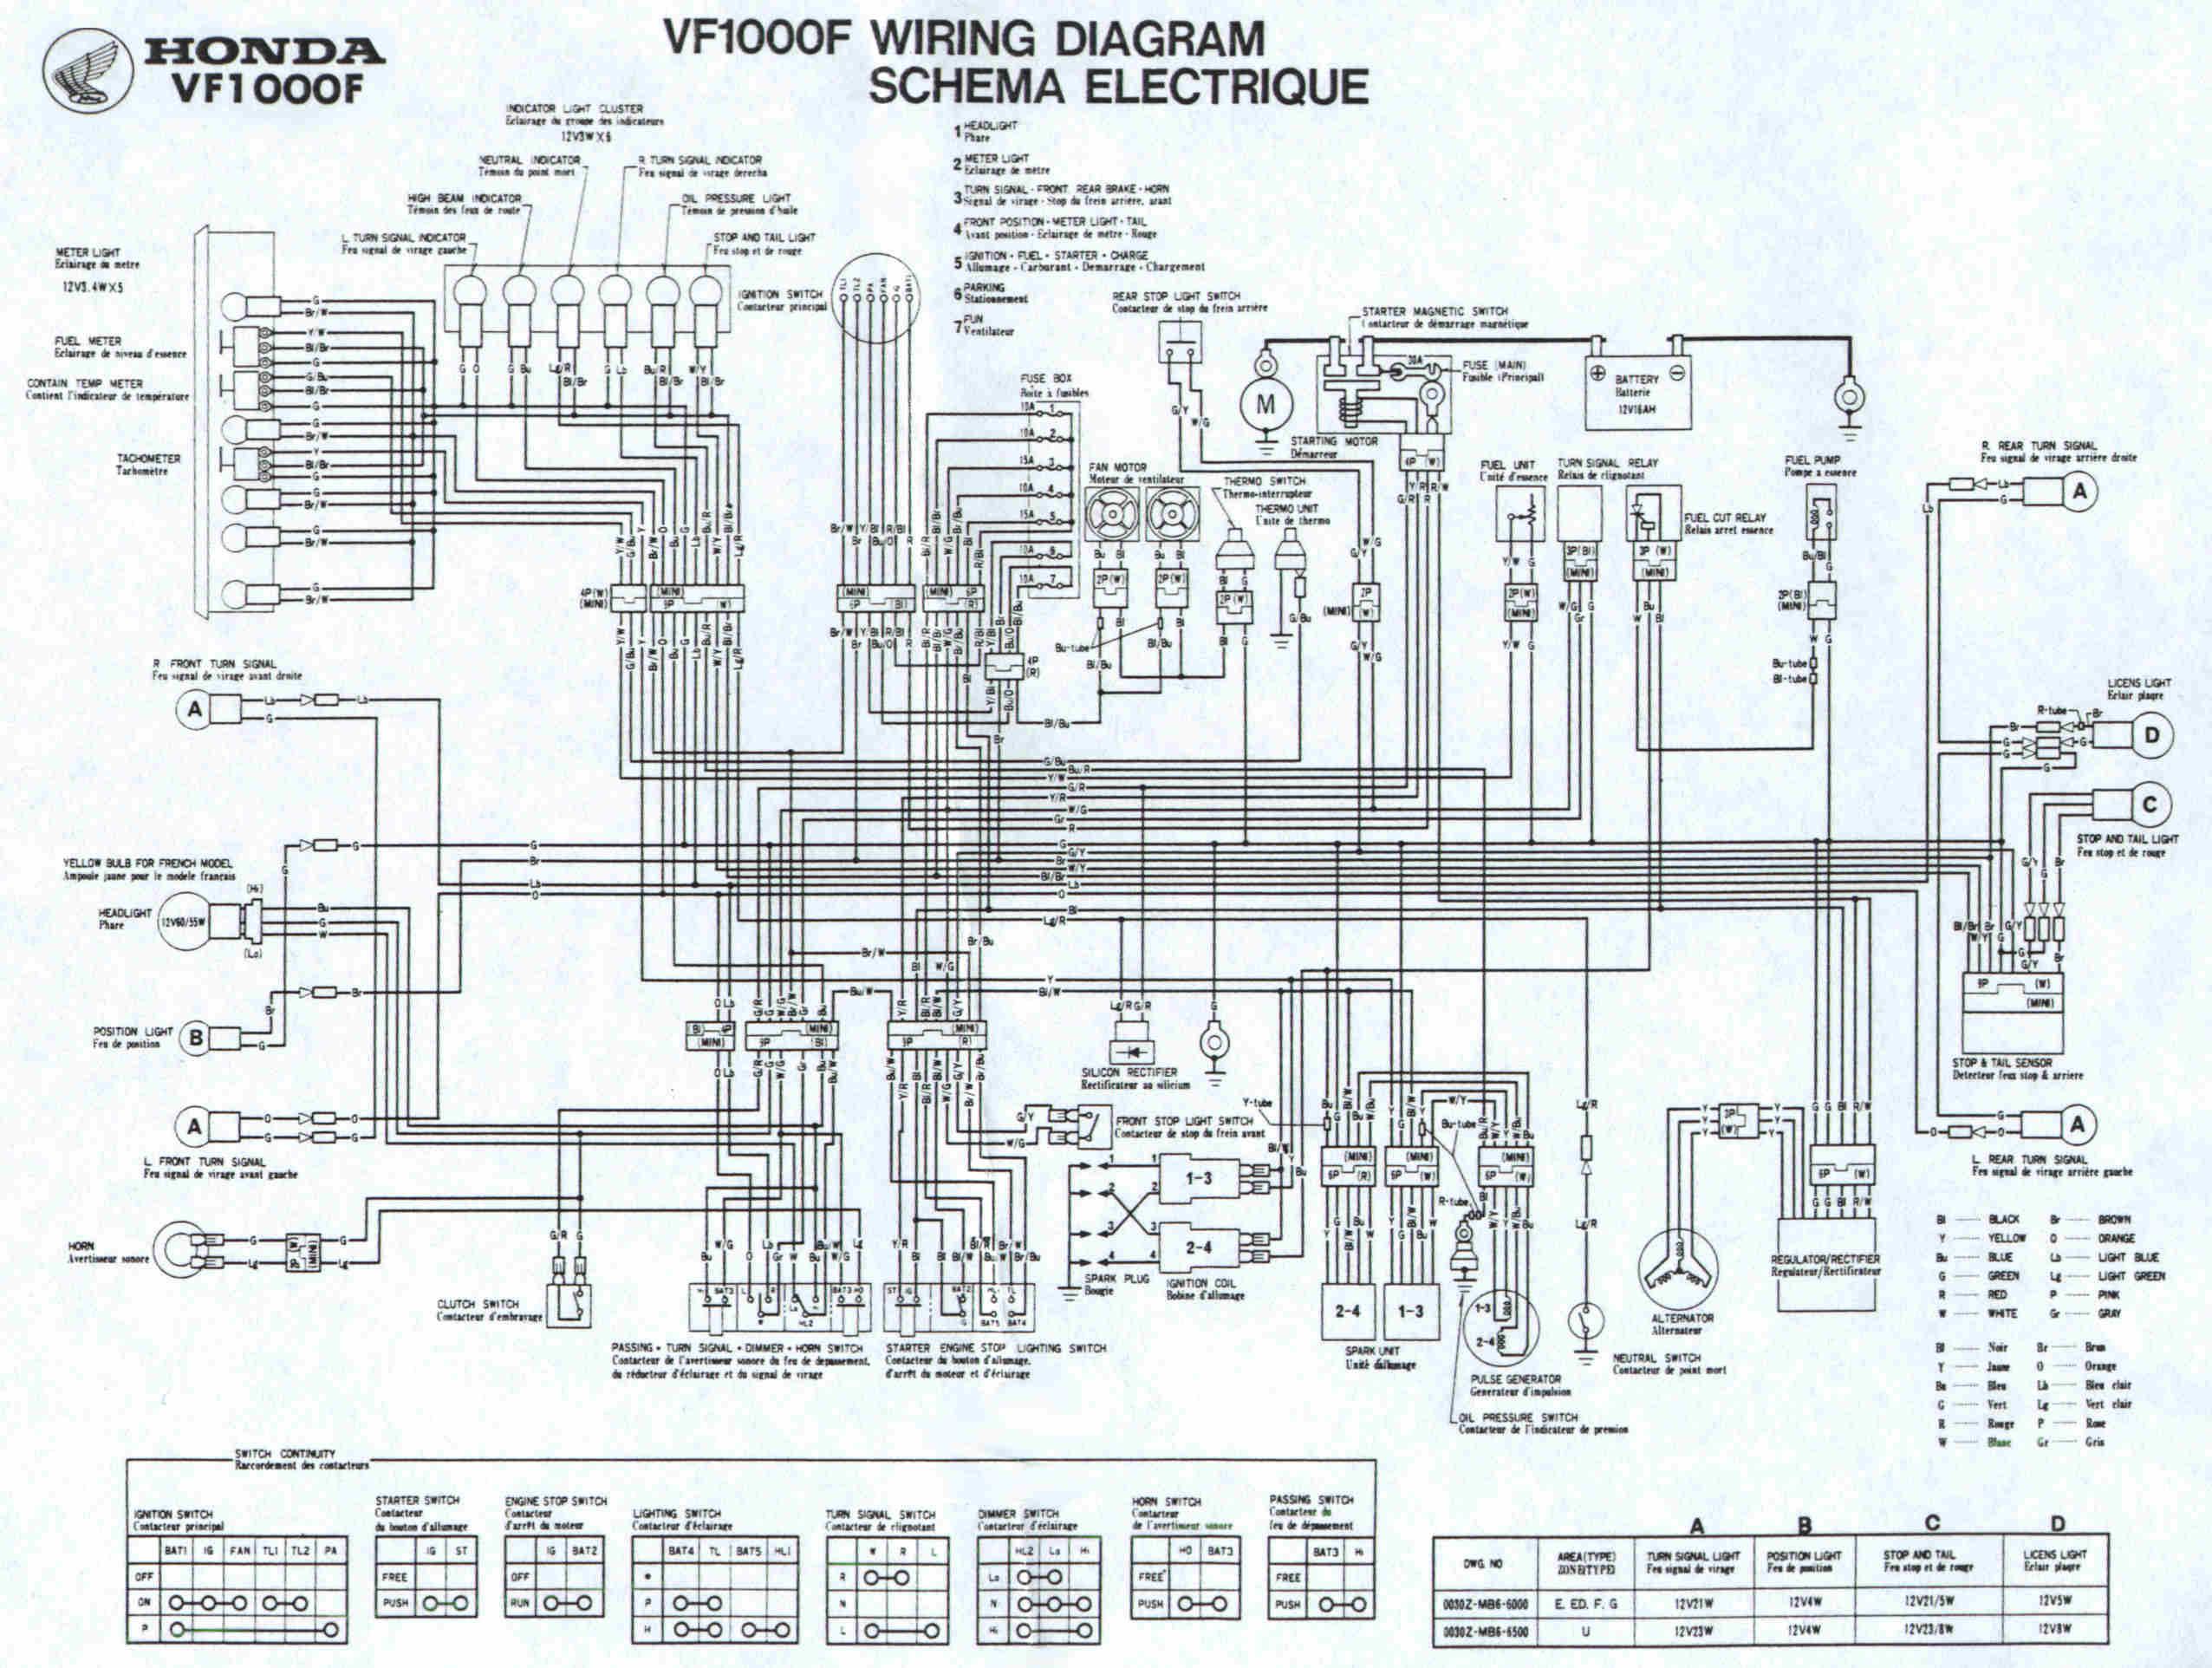 06 vt1100 wiring diagram - fusebox and wiring diagram layout-hut - layout -hut.sirtarghe.it  sirtarghe.it